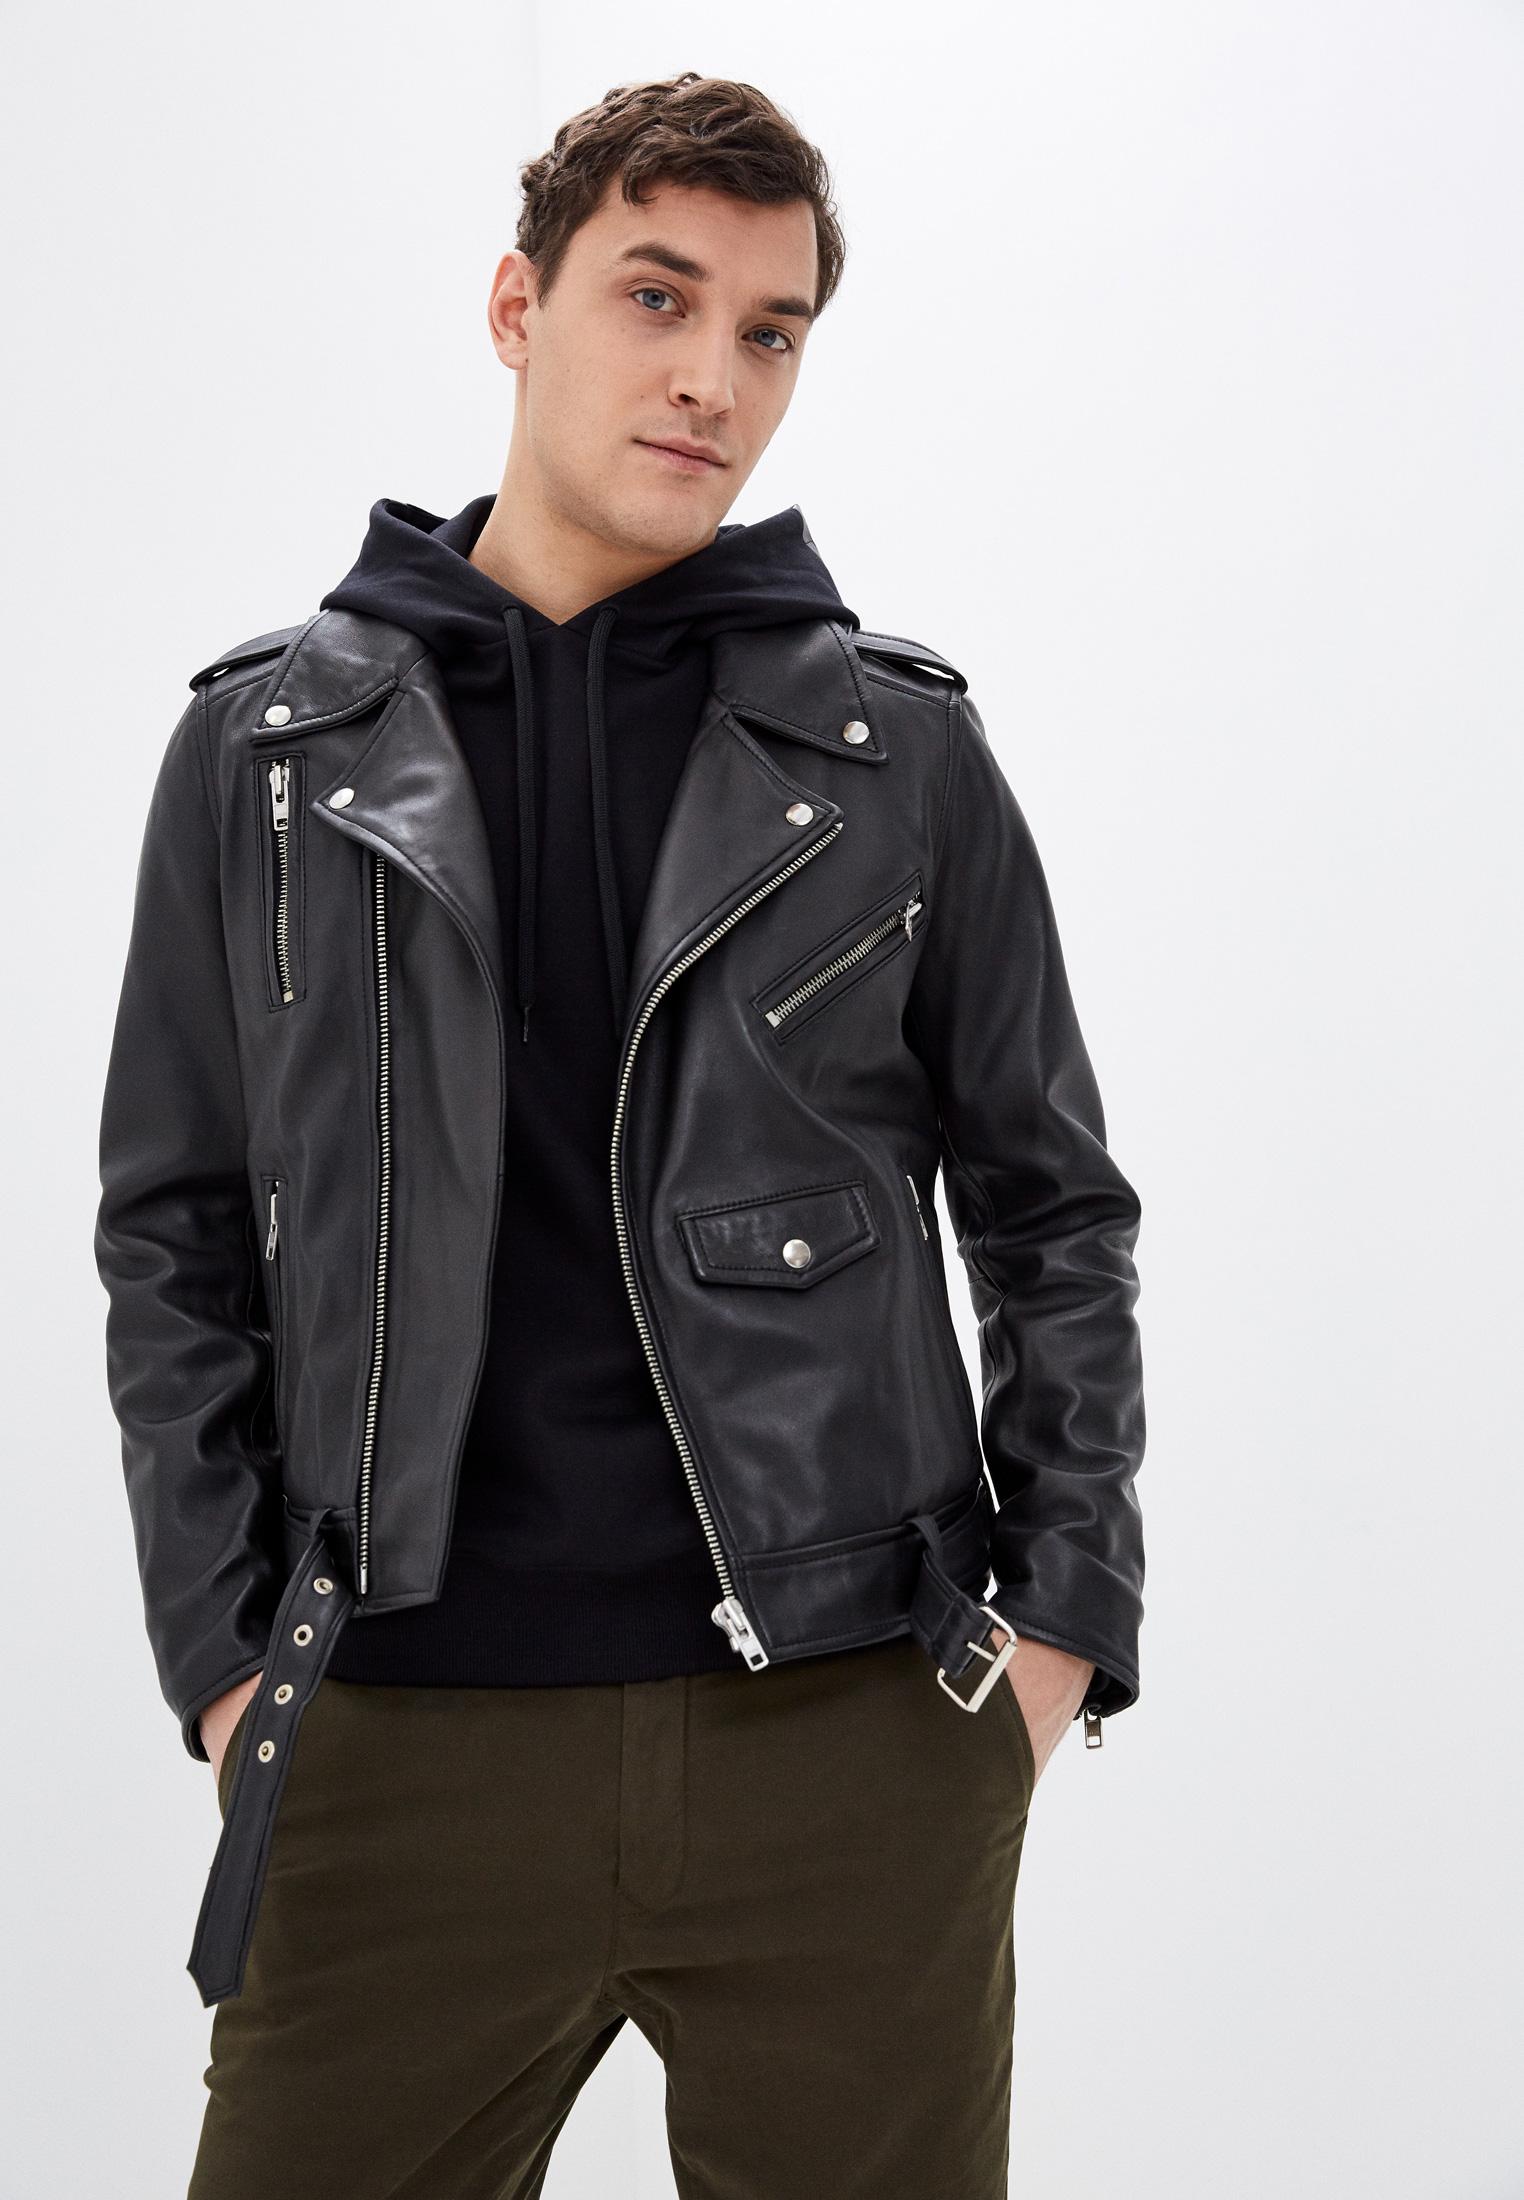 Кожаная куртка Serge Pariente style 17